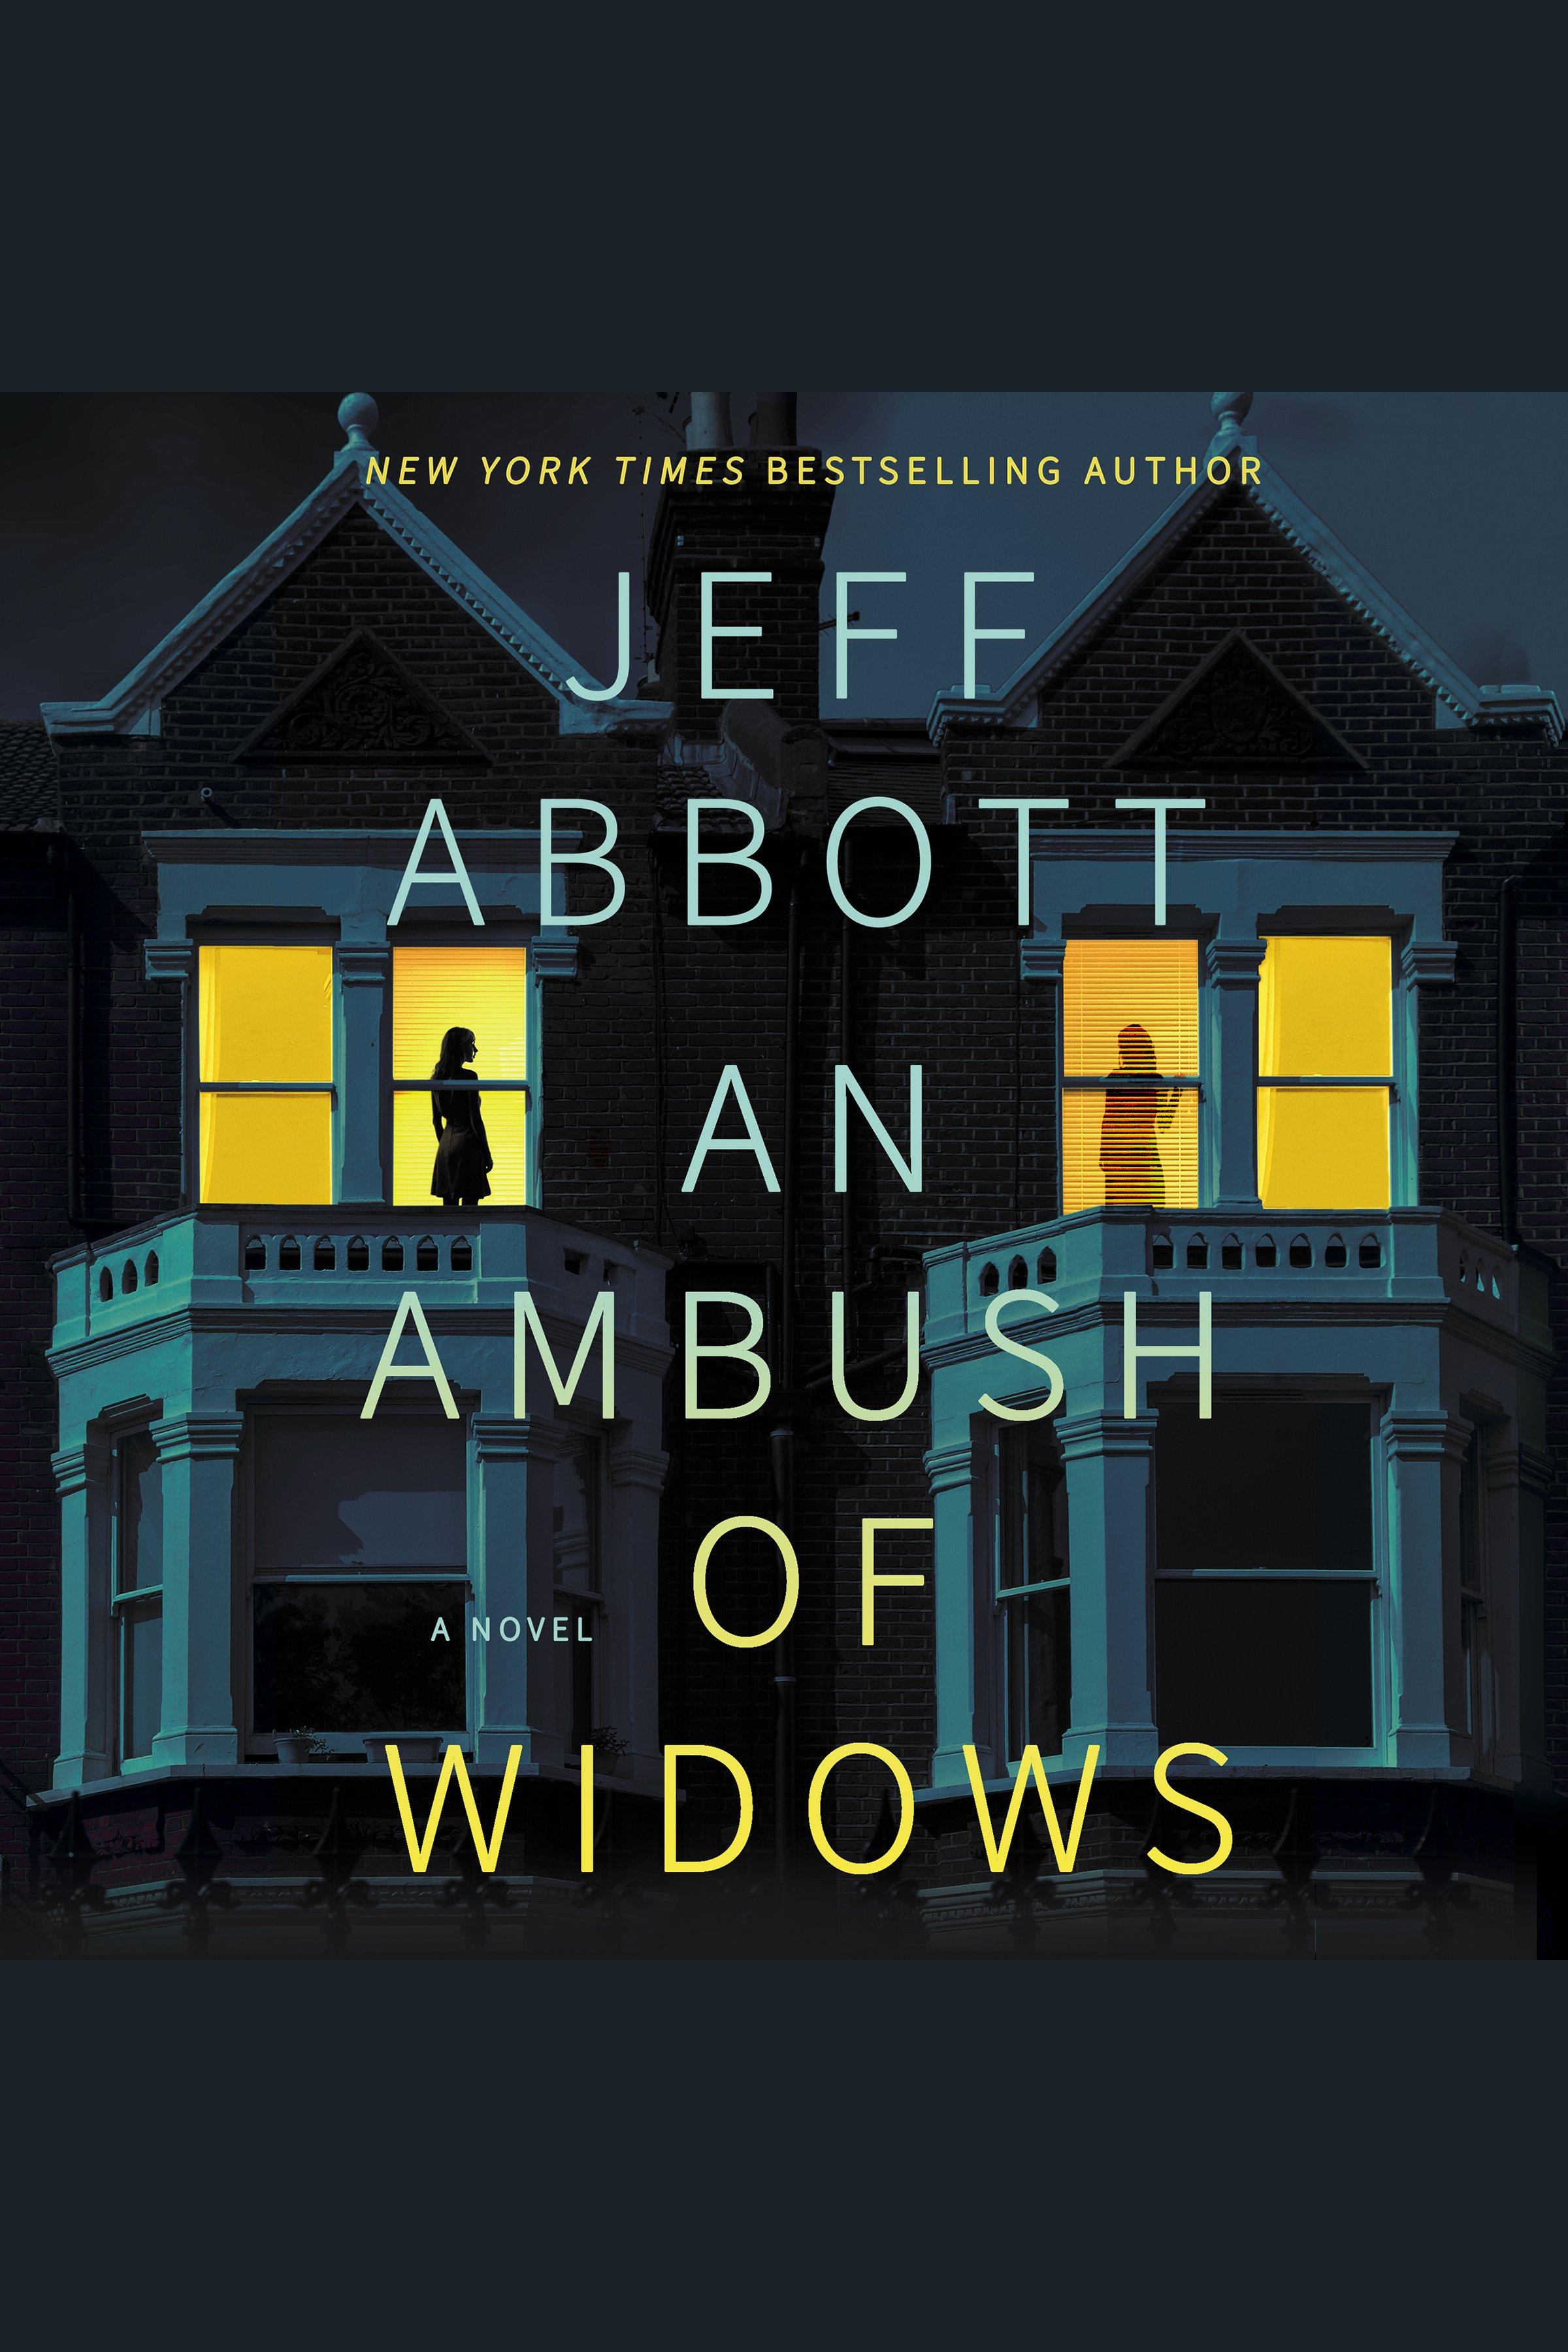 Ambush Of Widows, An